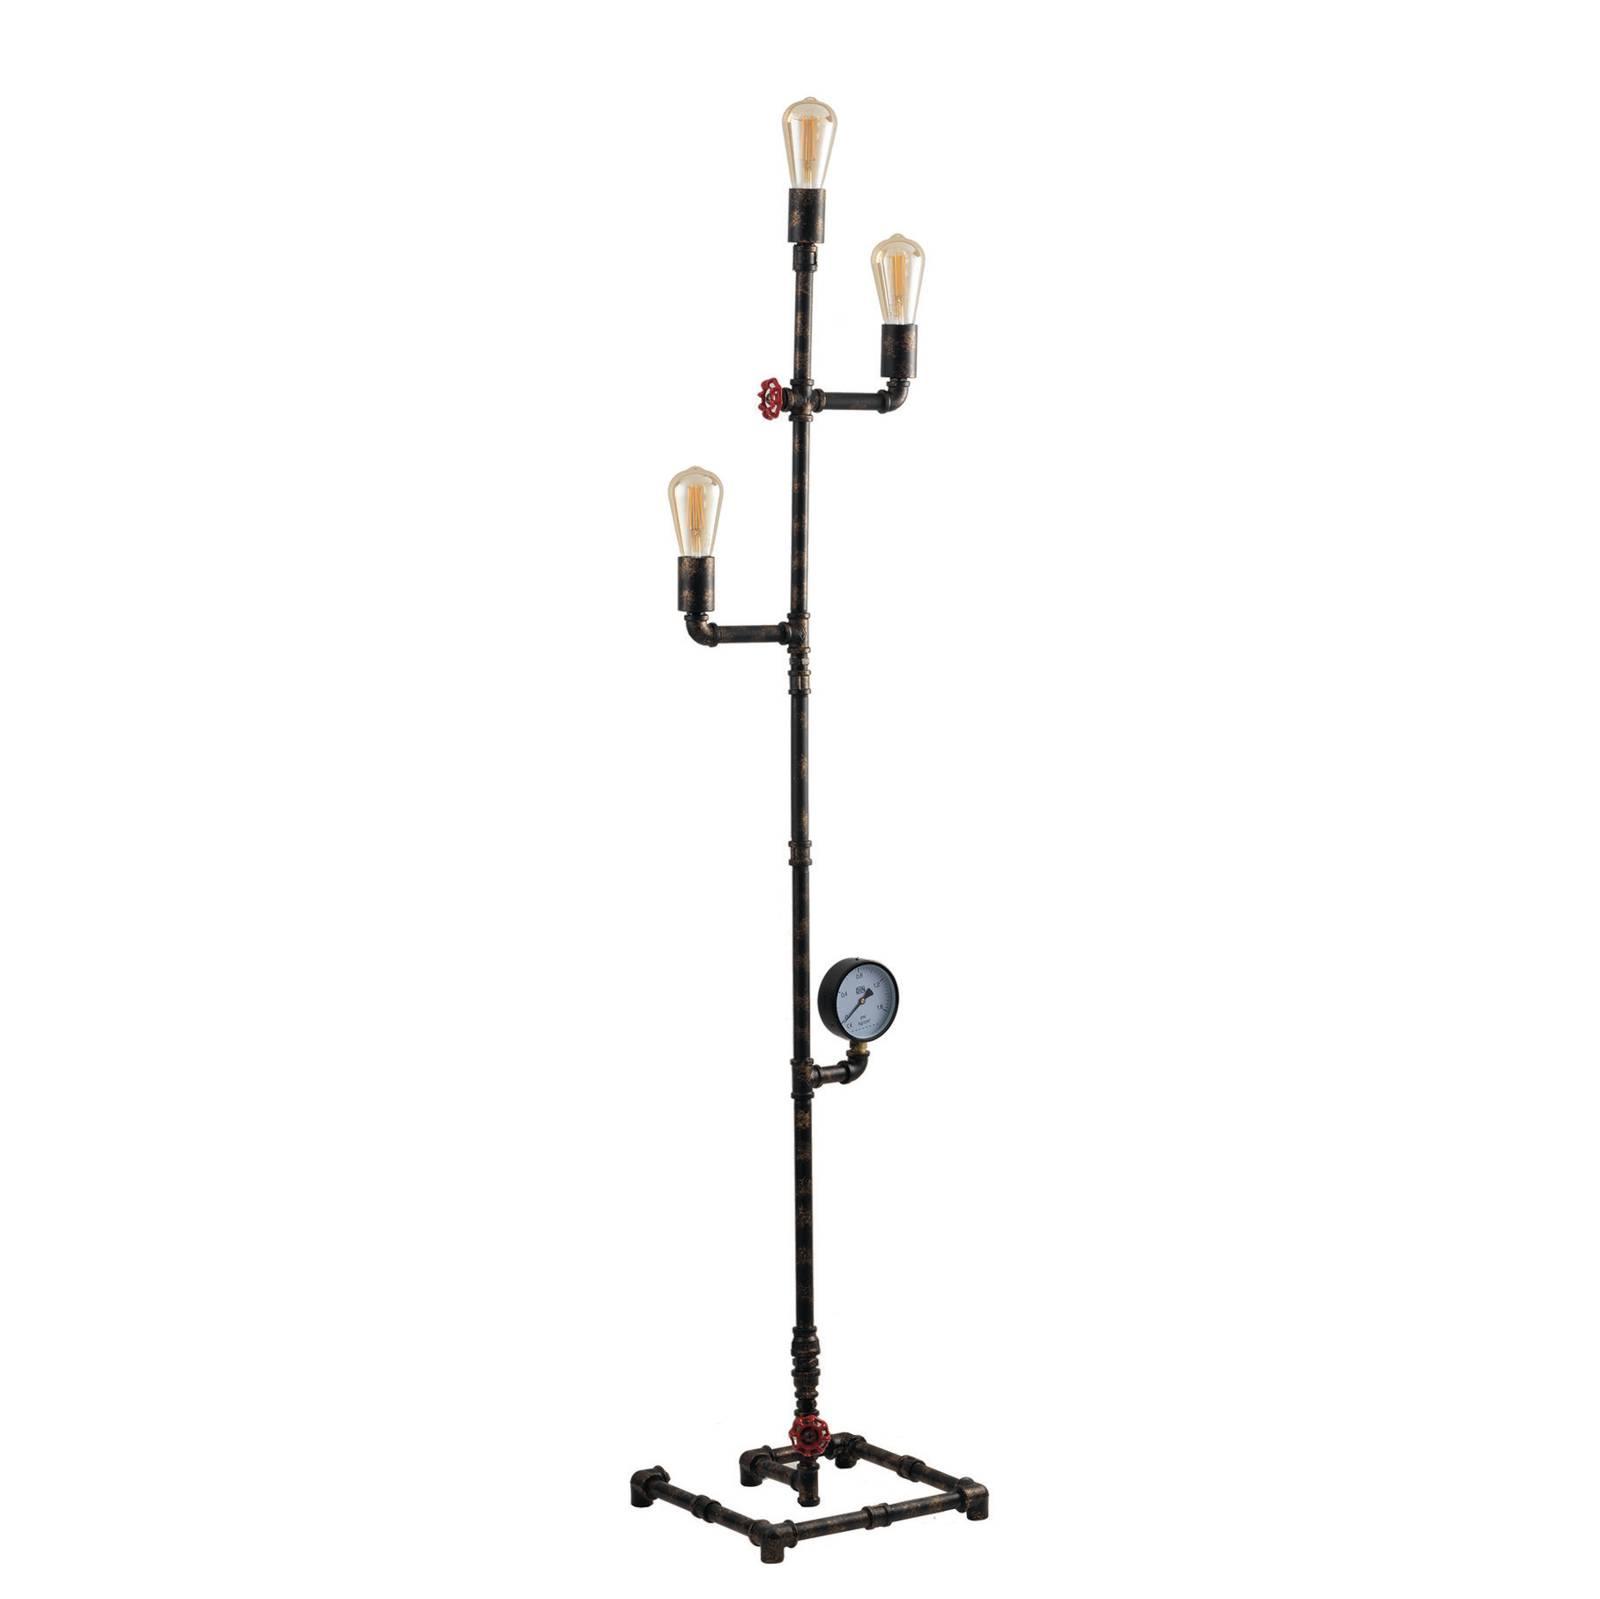 Vloerlamp Amarcord, roestbruin, 3-lamps